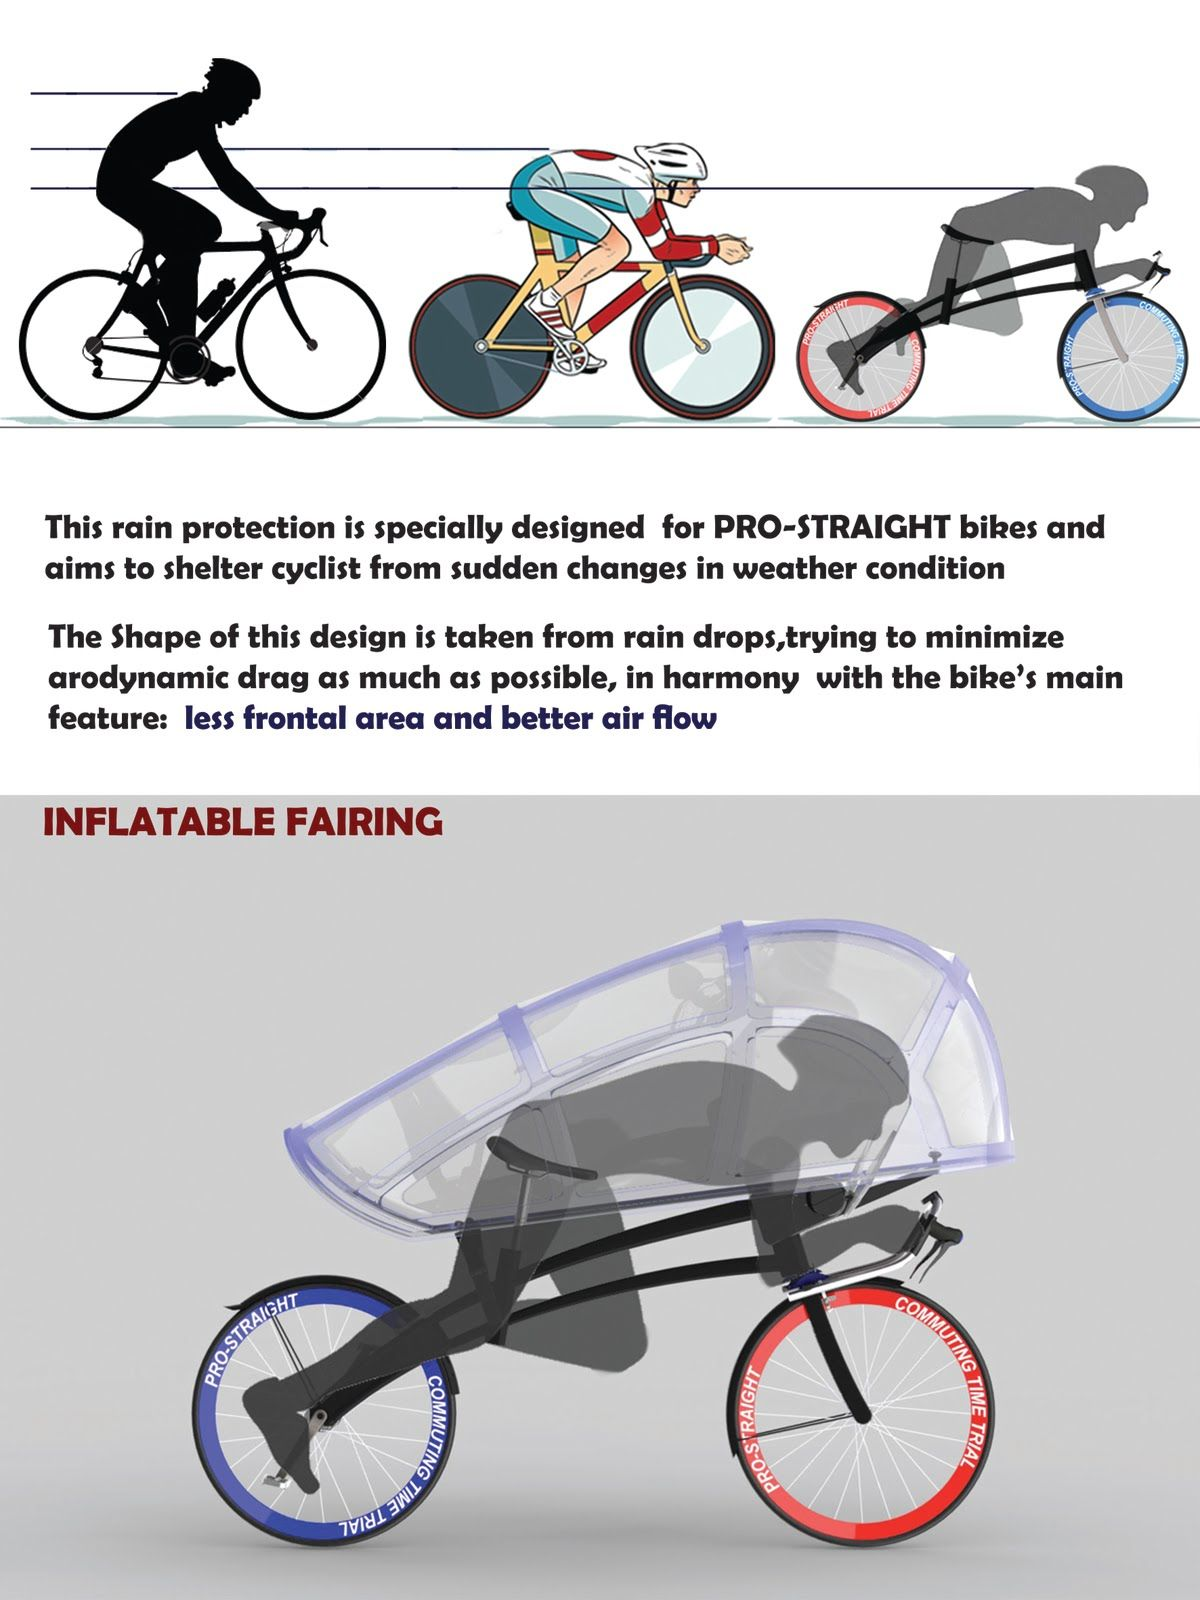 Inflatable Fairing By Moshen Saleh